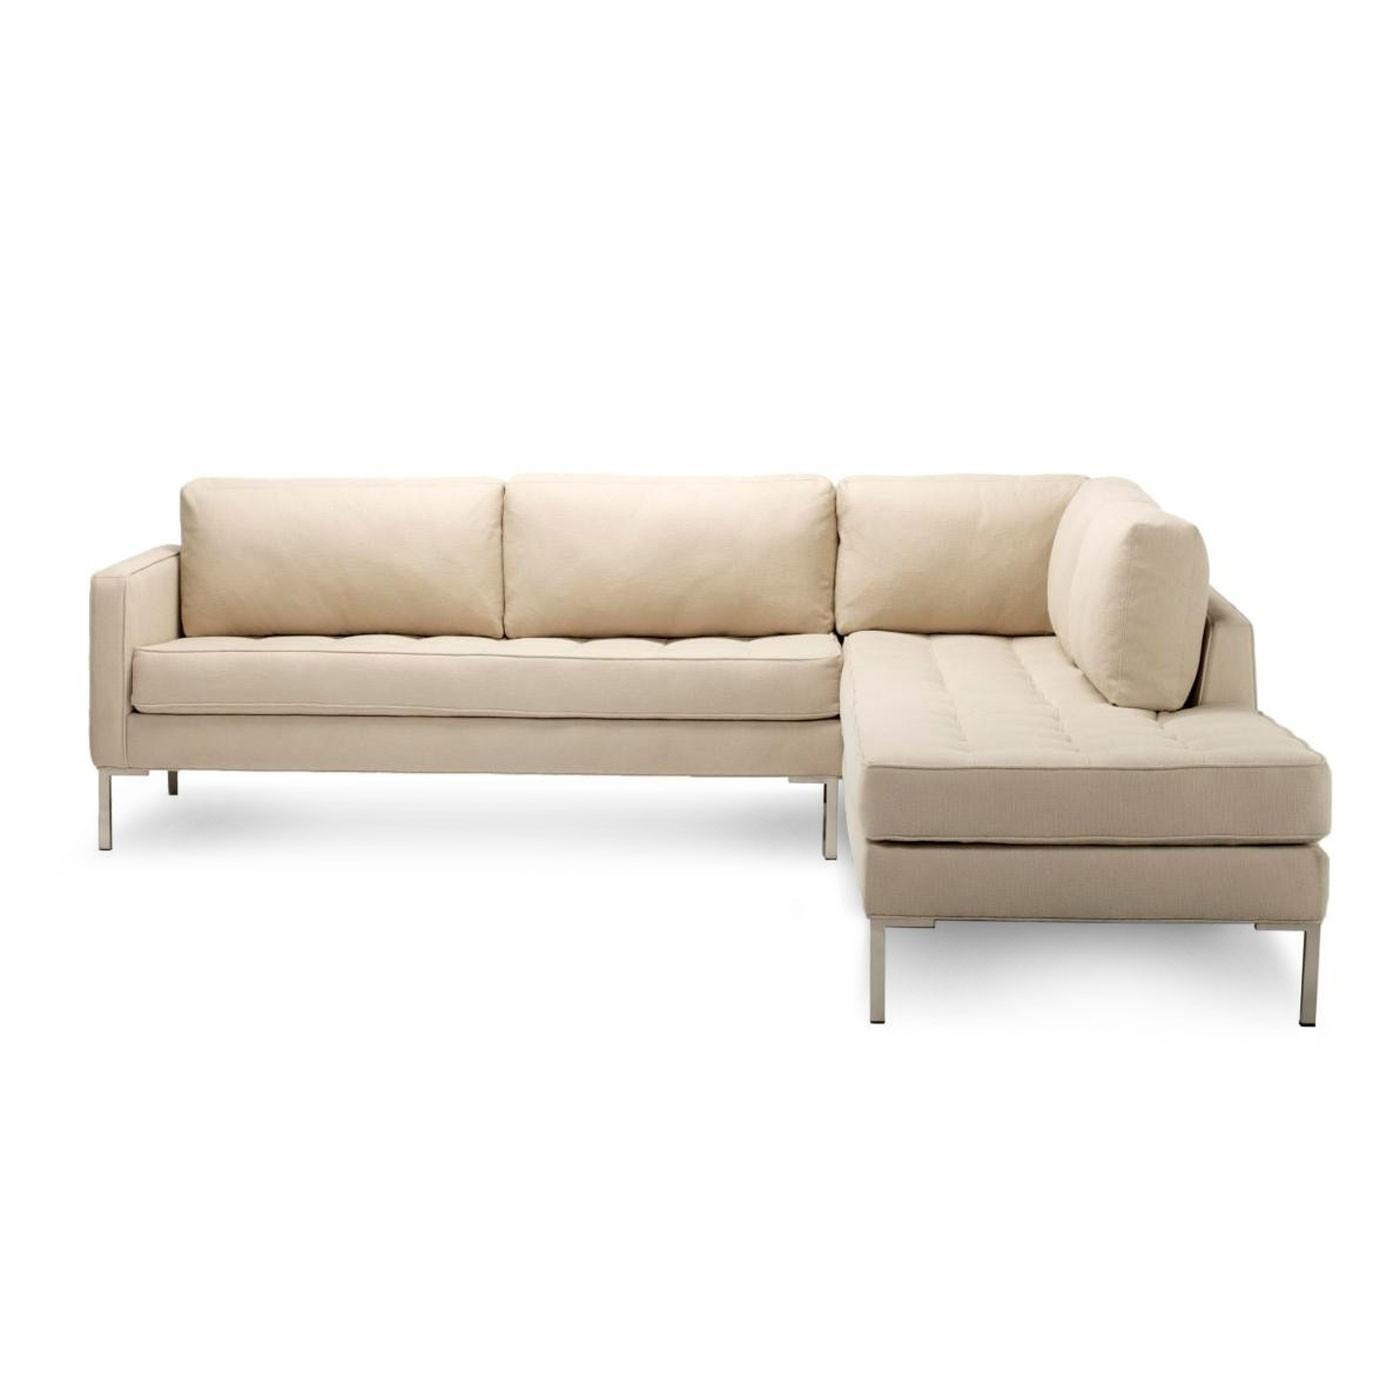 Furniture: Sofa For Sale   Armless Sofas   Armless Settee Regarding Armless Sectional Sofas (Image 6 of 15)